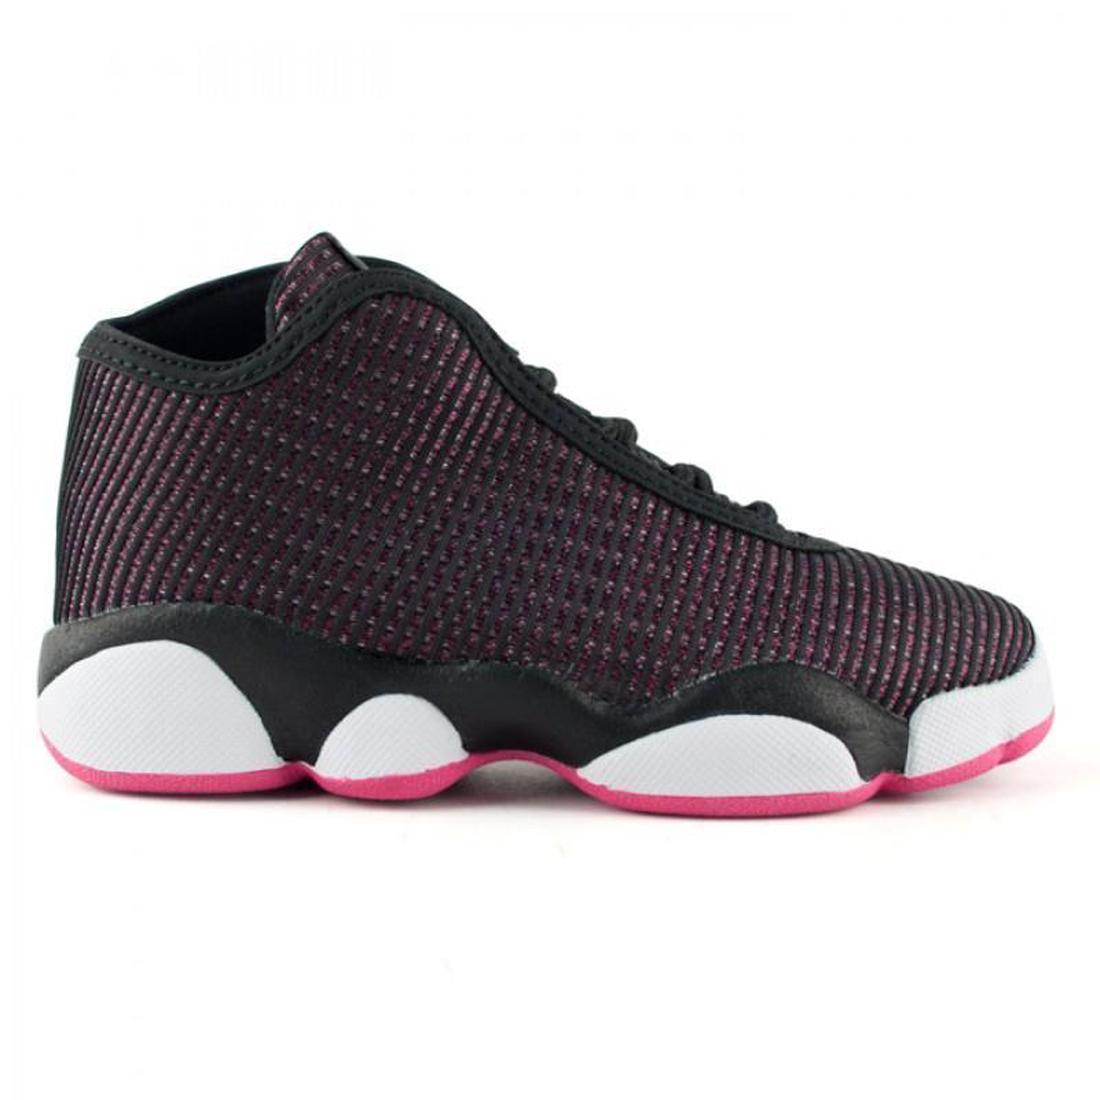 pretty nice 8858f 66ad2 JORDAN Big Kid Girls Black White Pink Horizon Sneakers 819848 Sz 7.5Y  120  NWOB